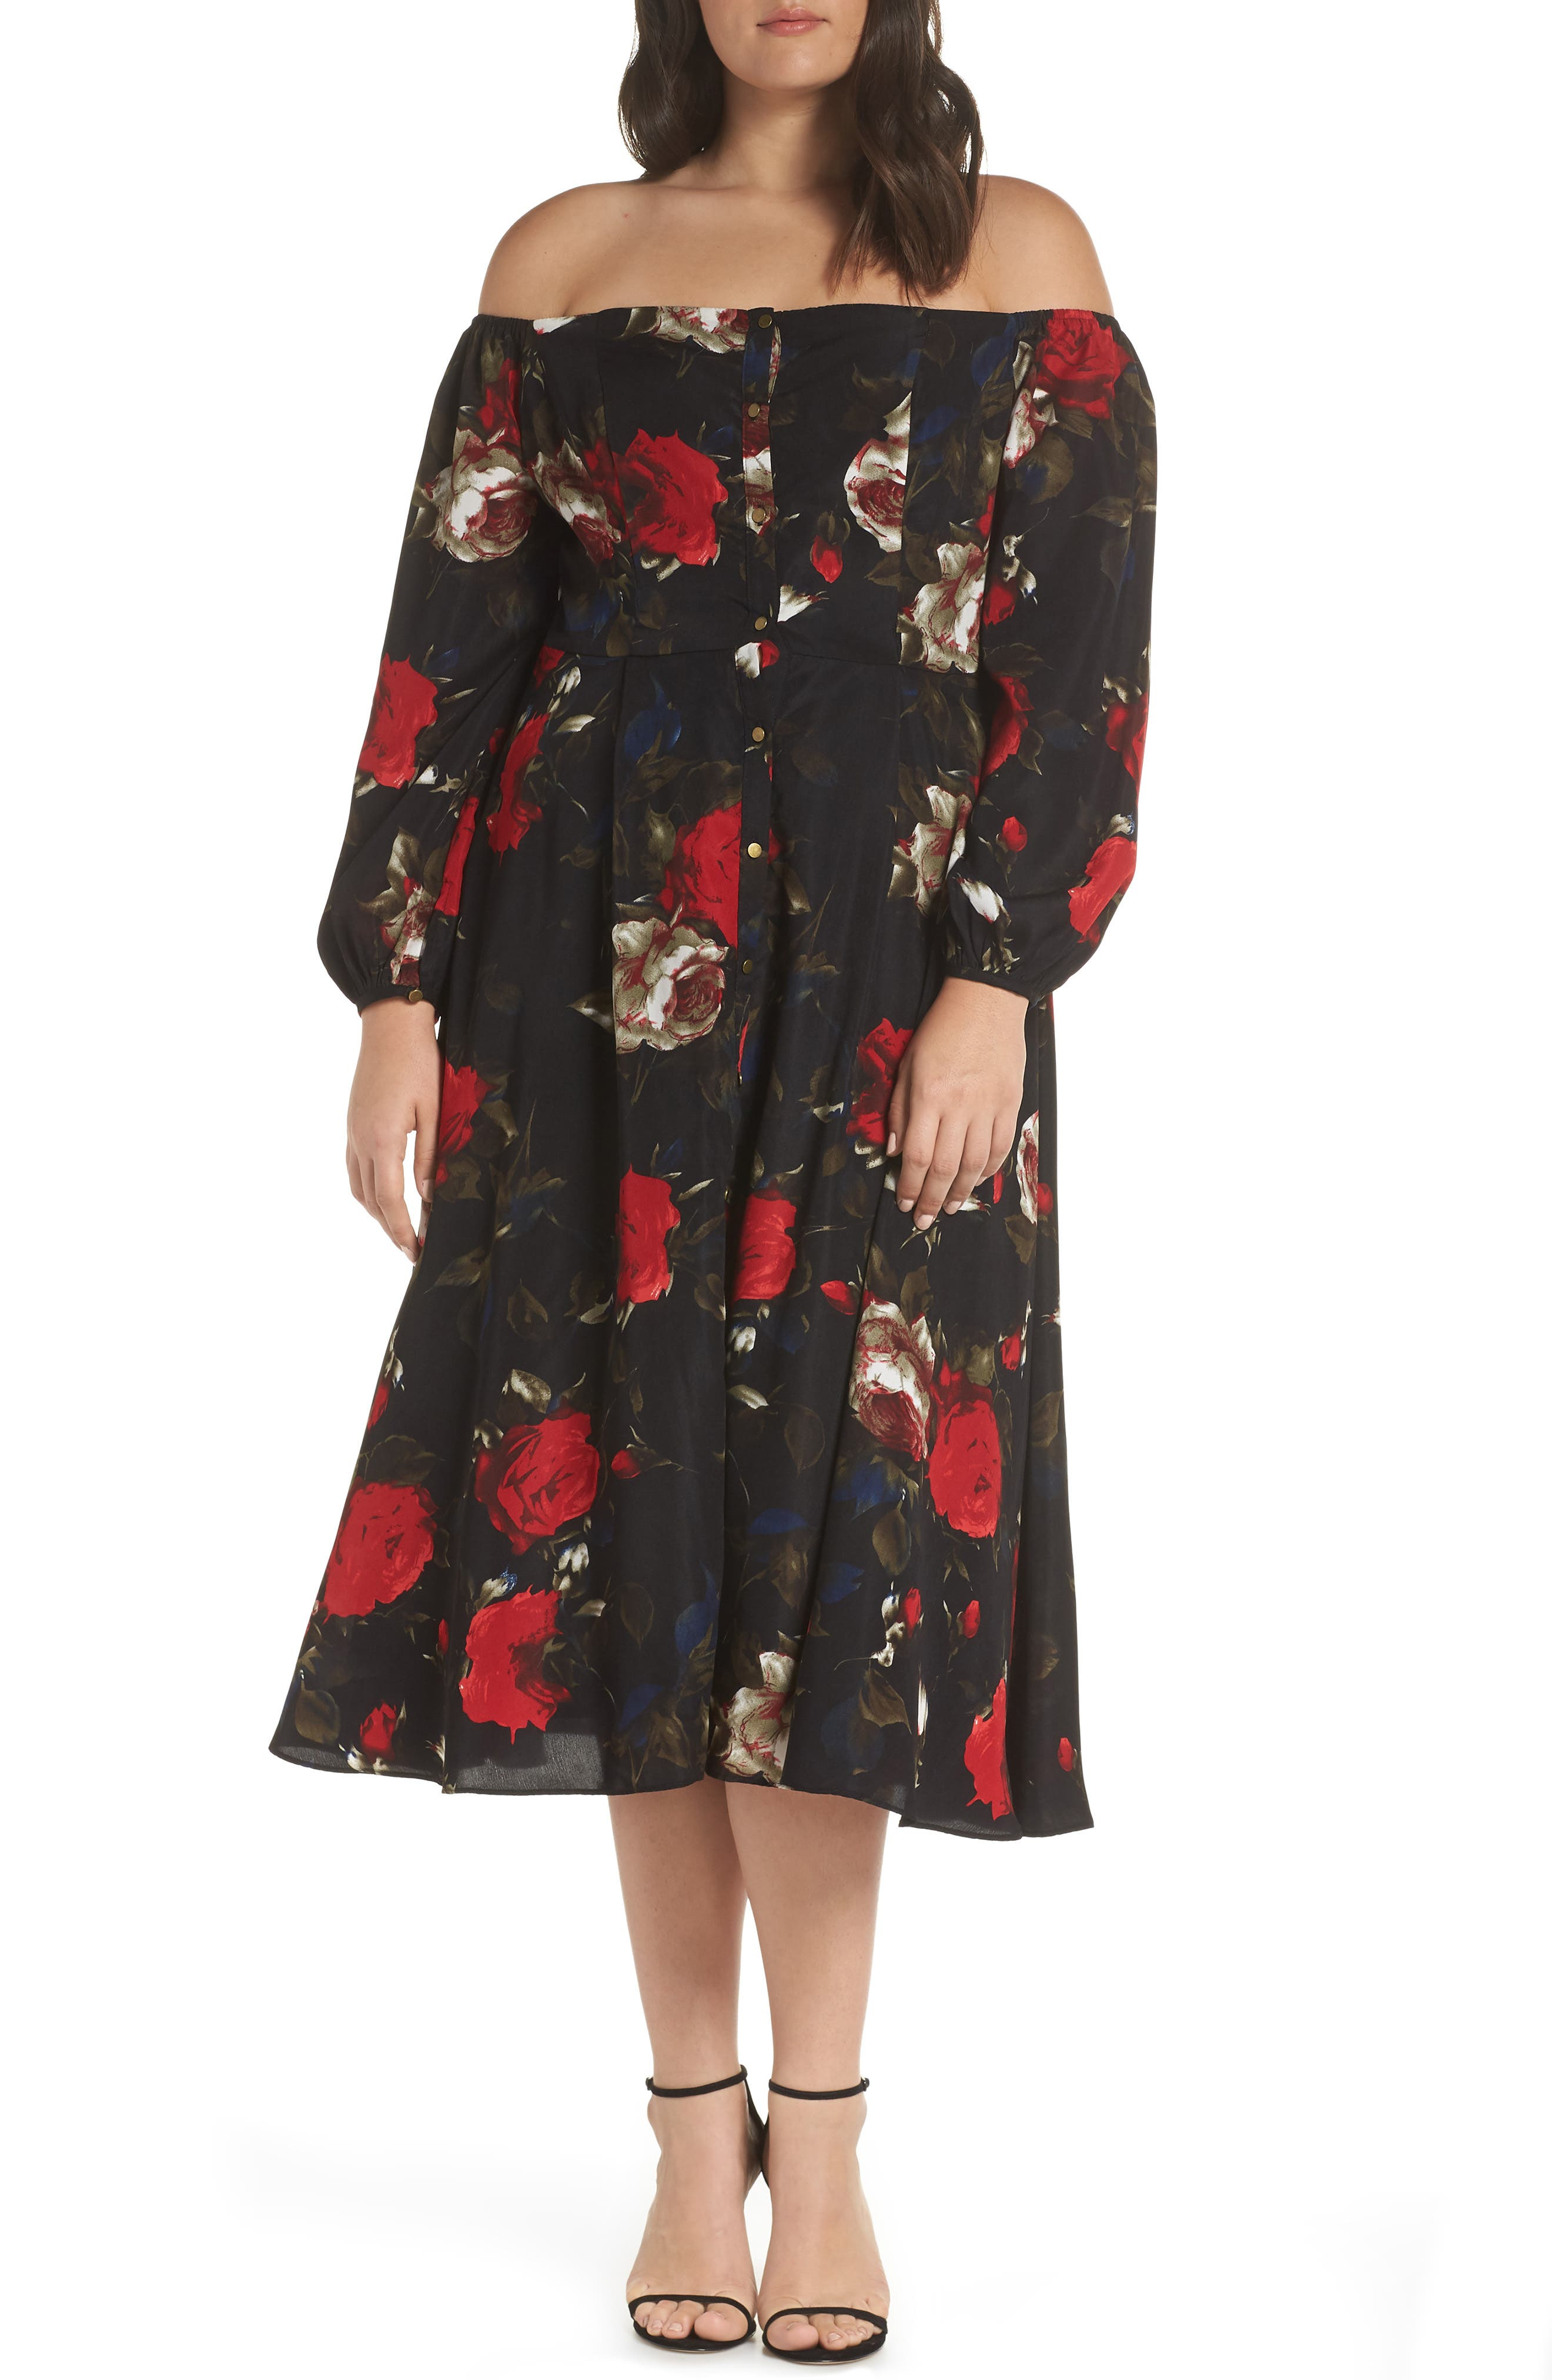 Off the Shoulder Midi Dress,                             Alternate thumbnail 2, color,                             BLACK LUSH ROSE FLORAL